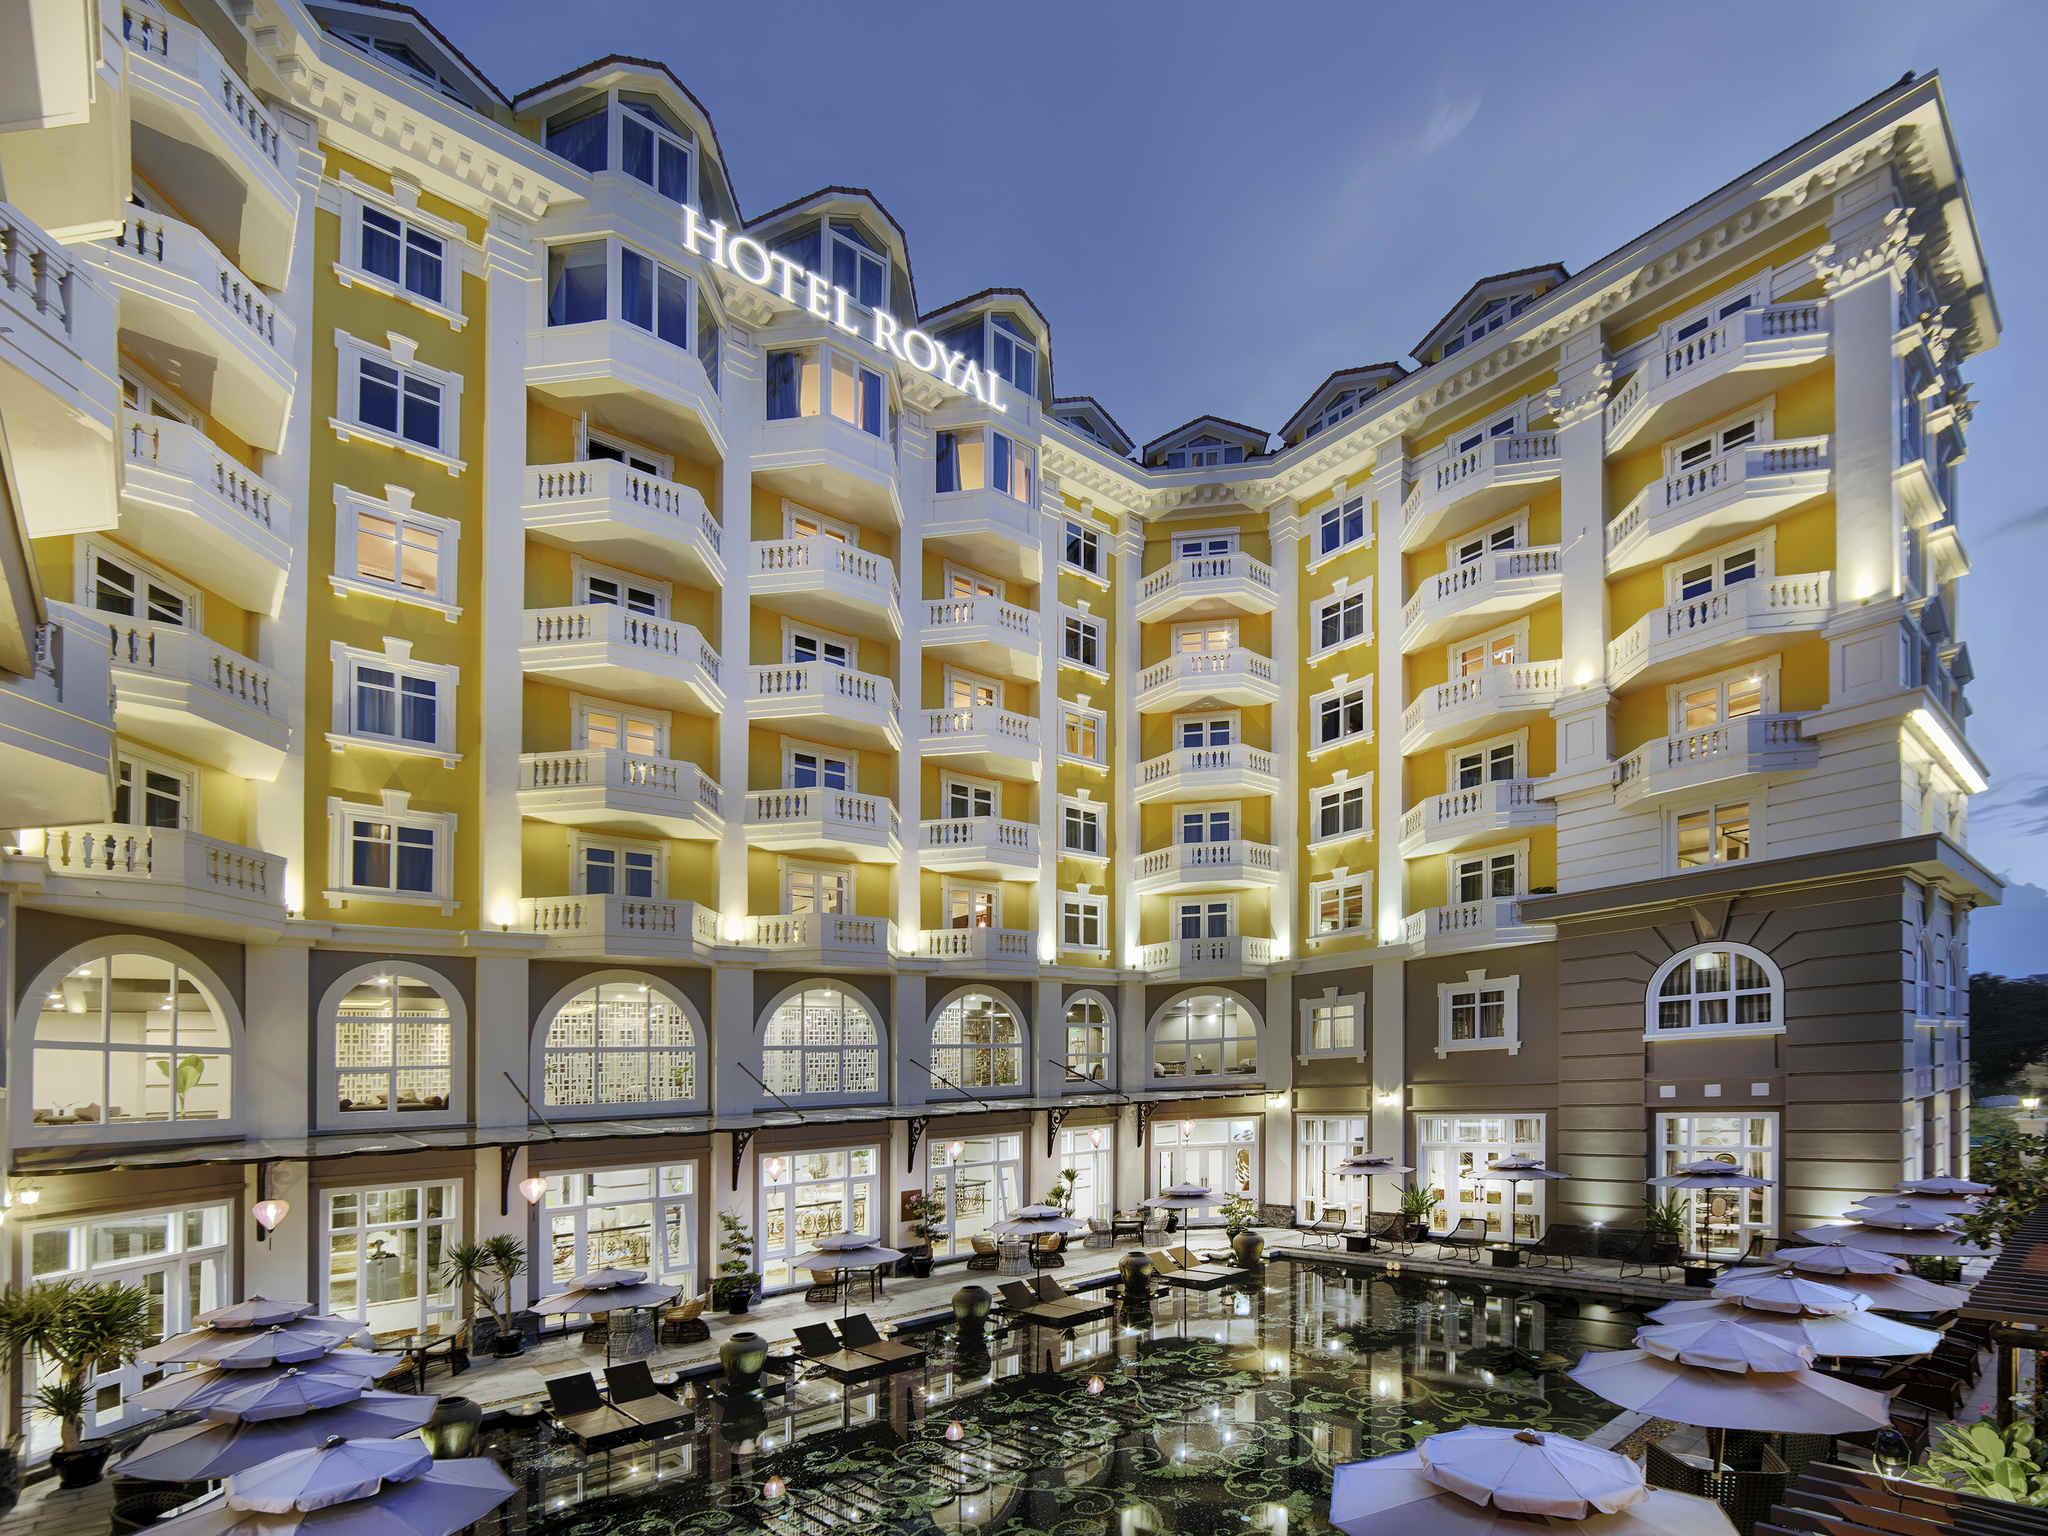 Hotel - Hotel Royal Hoi An - MGallery by Sofitel